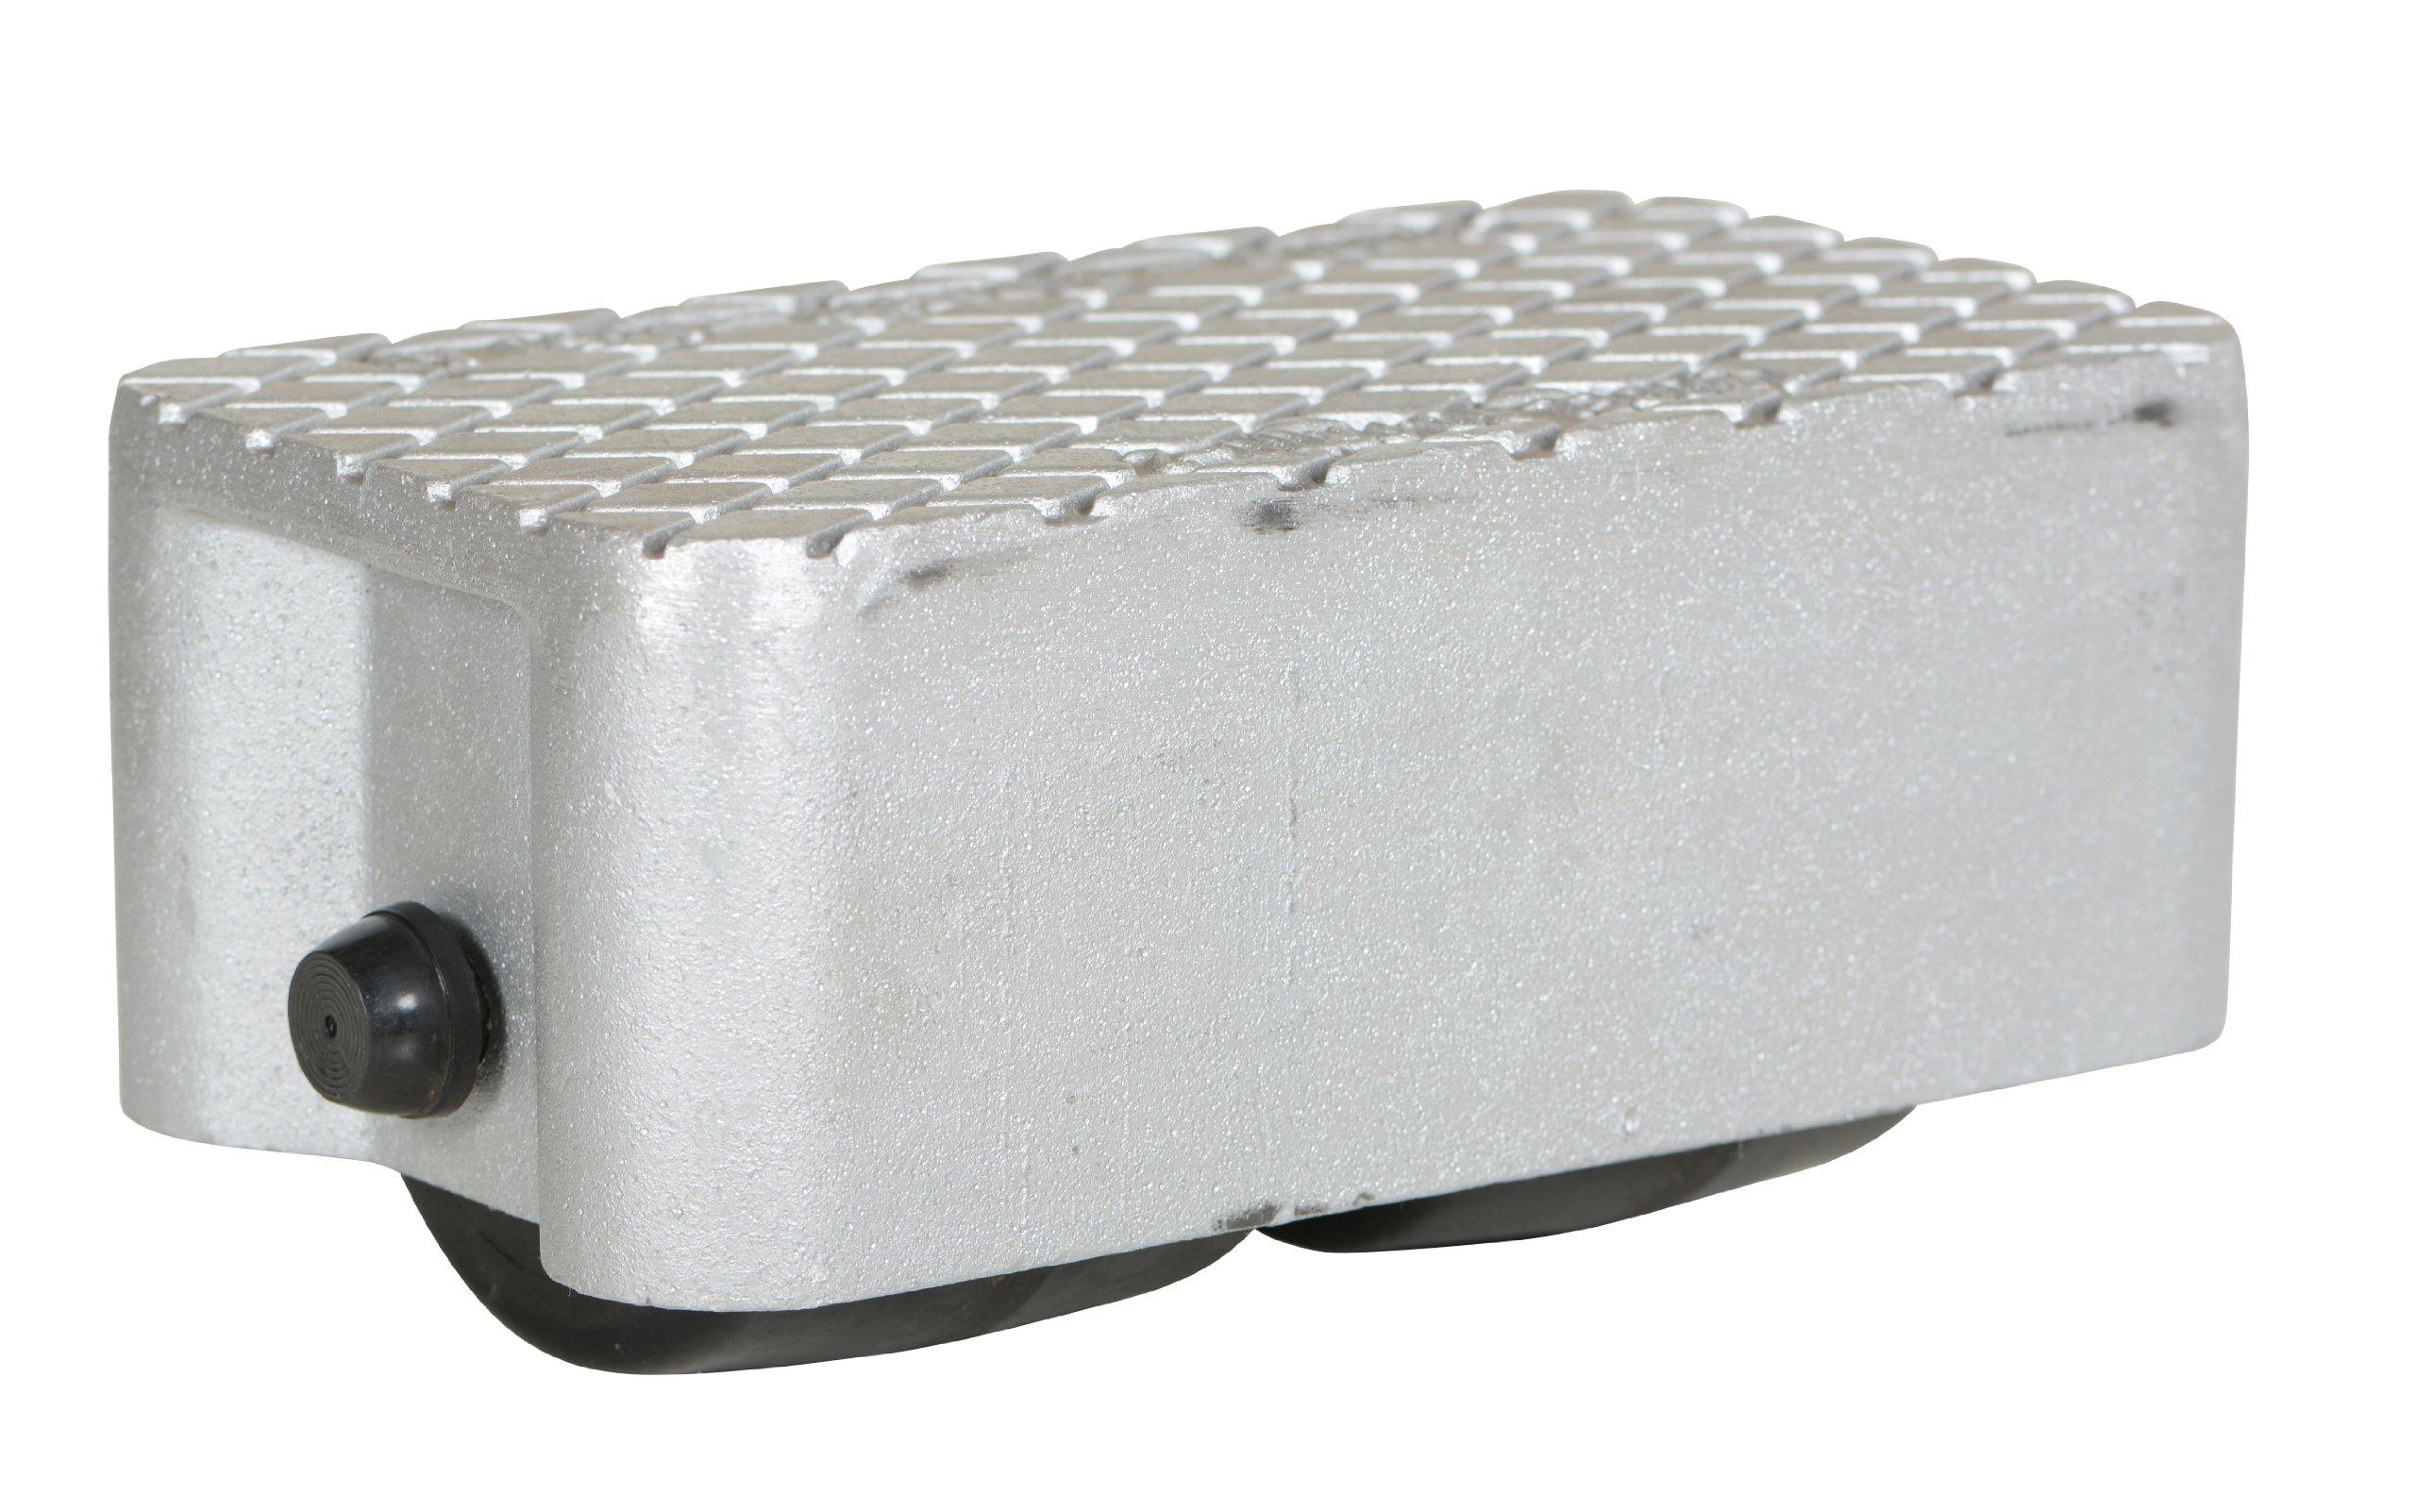 Vestil VPRDO-2 Cast Aluminum Propel Dolly, 3000 lbs Capacity, 8-1/2'' Length x 4-3/4'' Width Deck, 4-1/4'' Overall Height